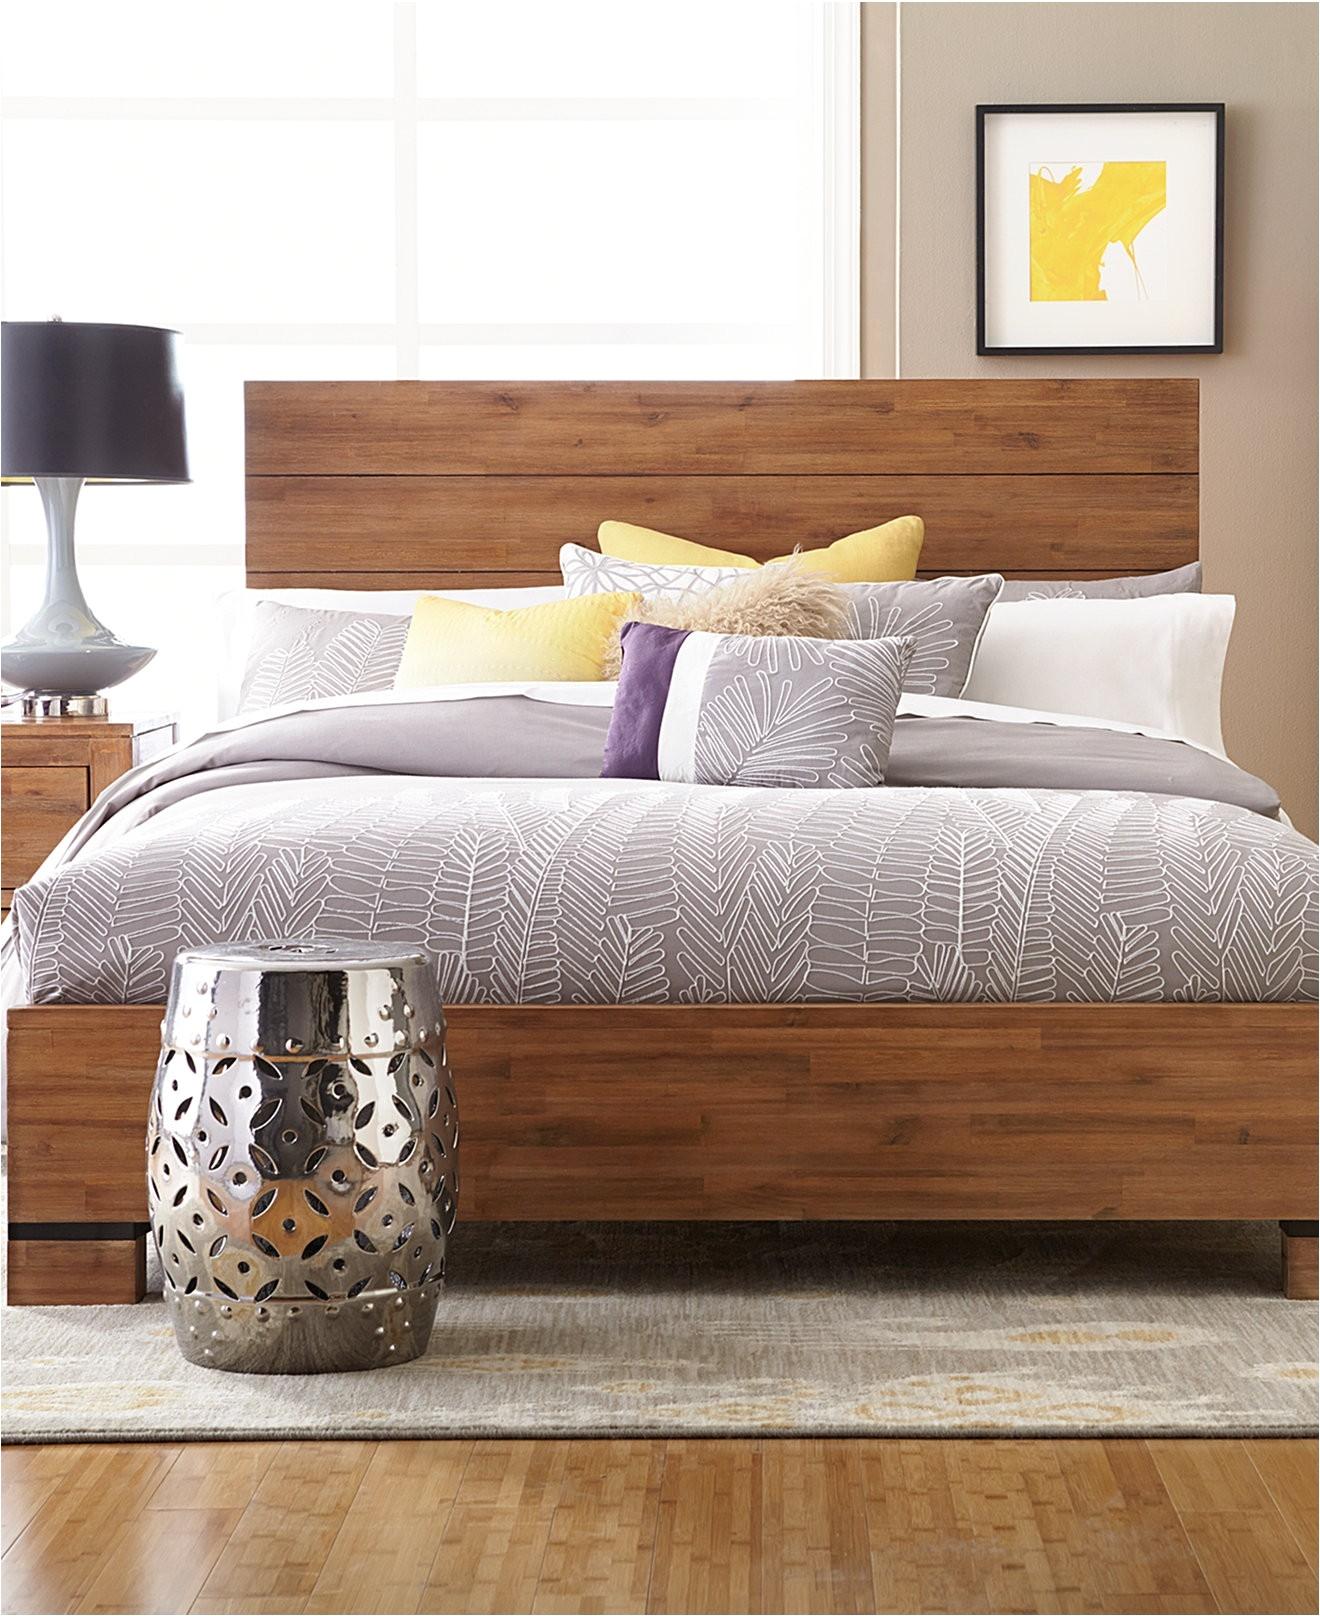 full size of home design macys bed comforters elegant home designs macys furniture bedroom sets large size of home design macys bed comforters elegant home